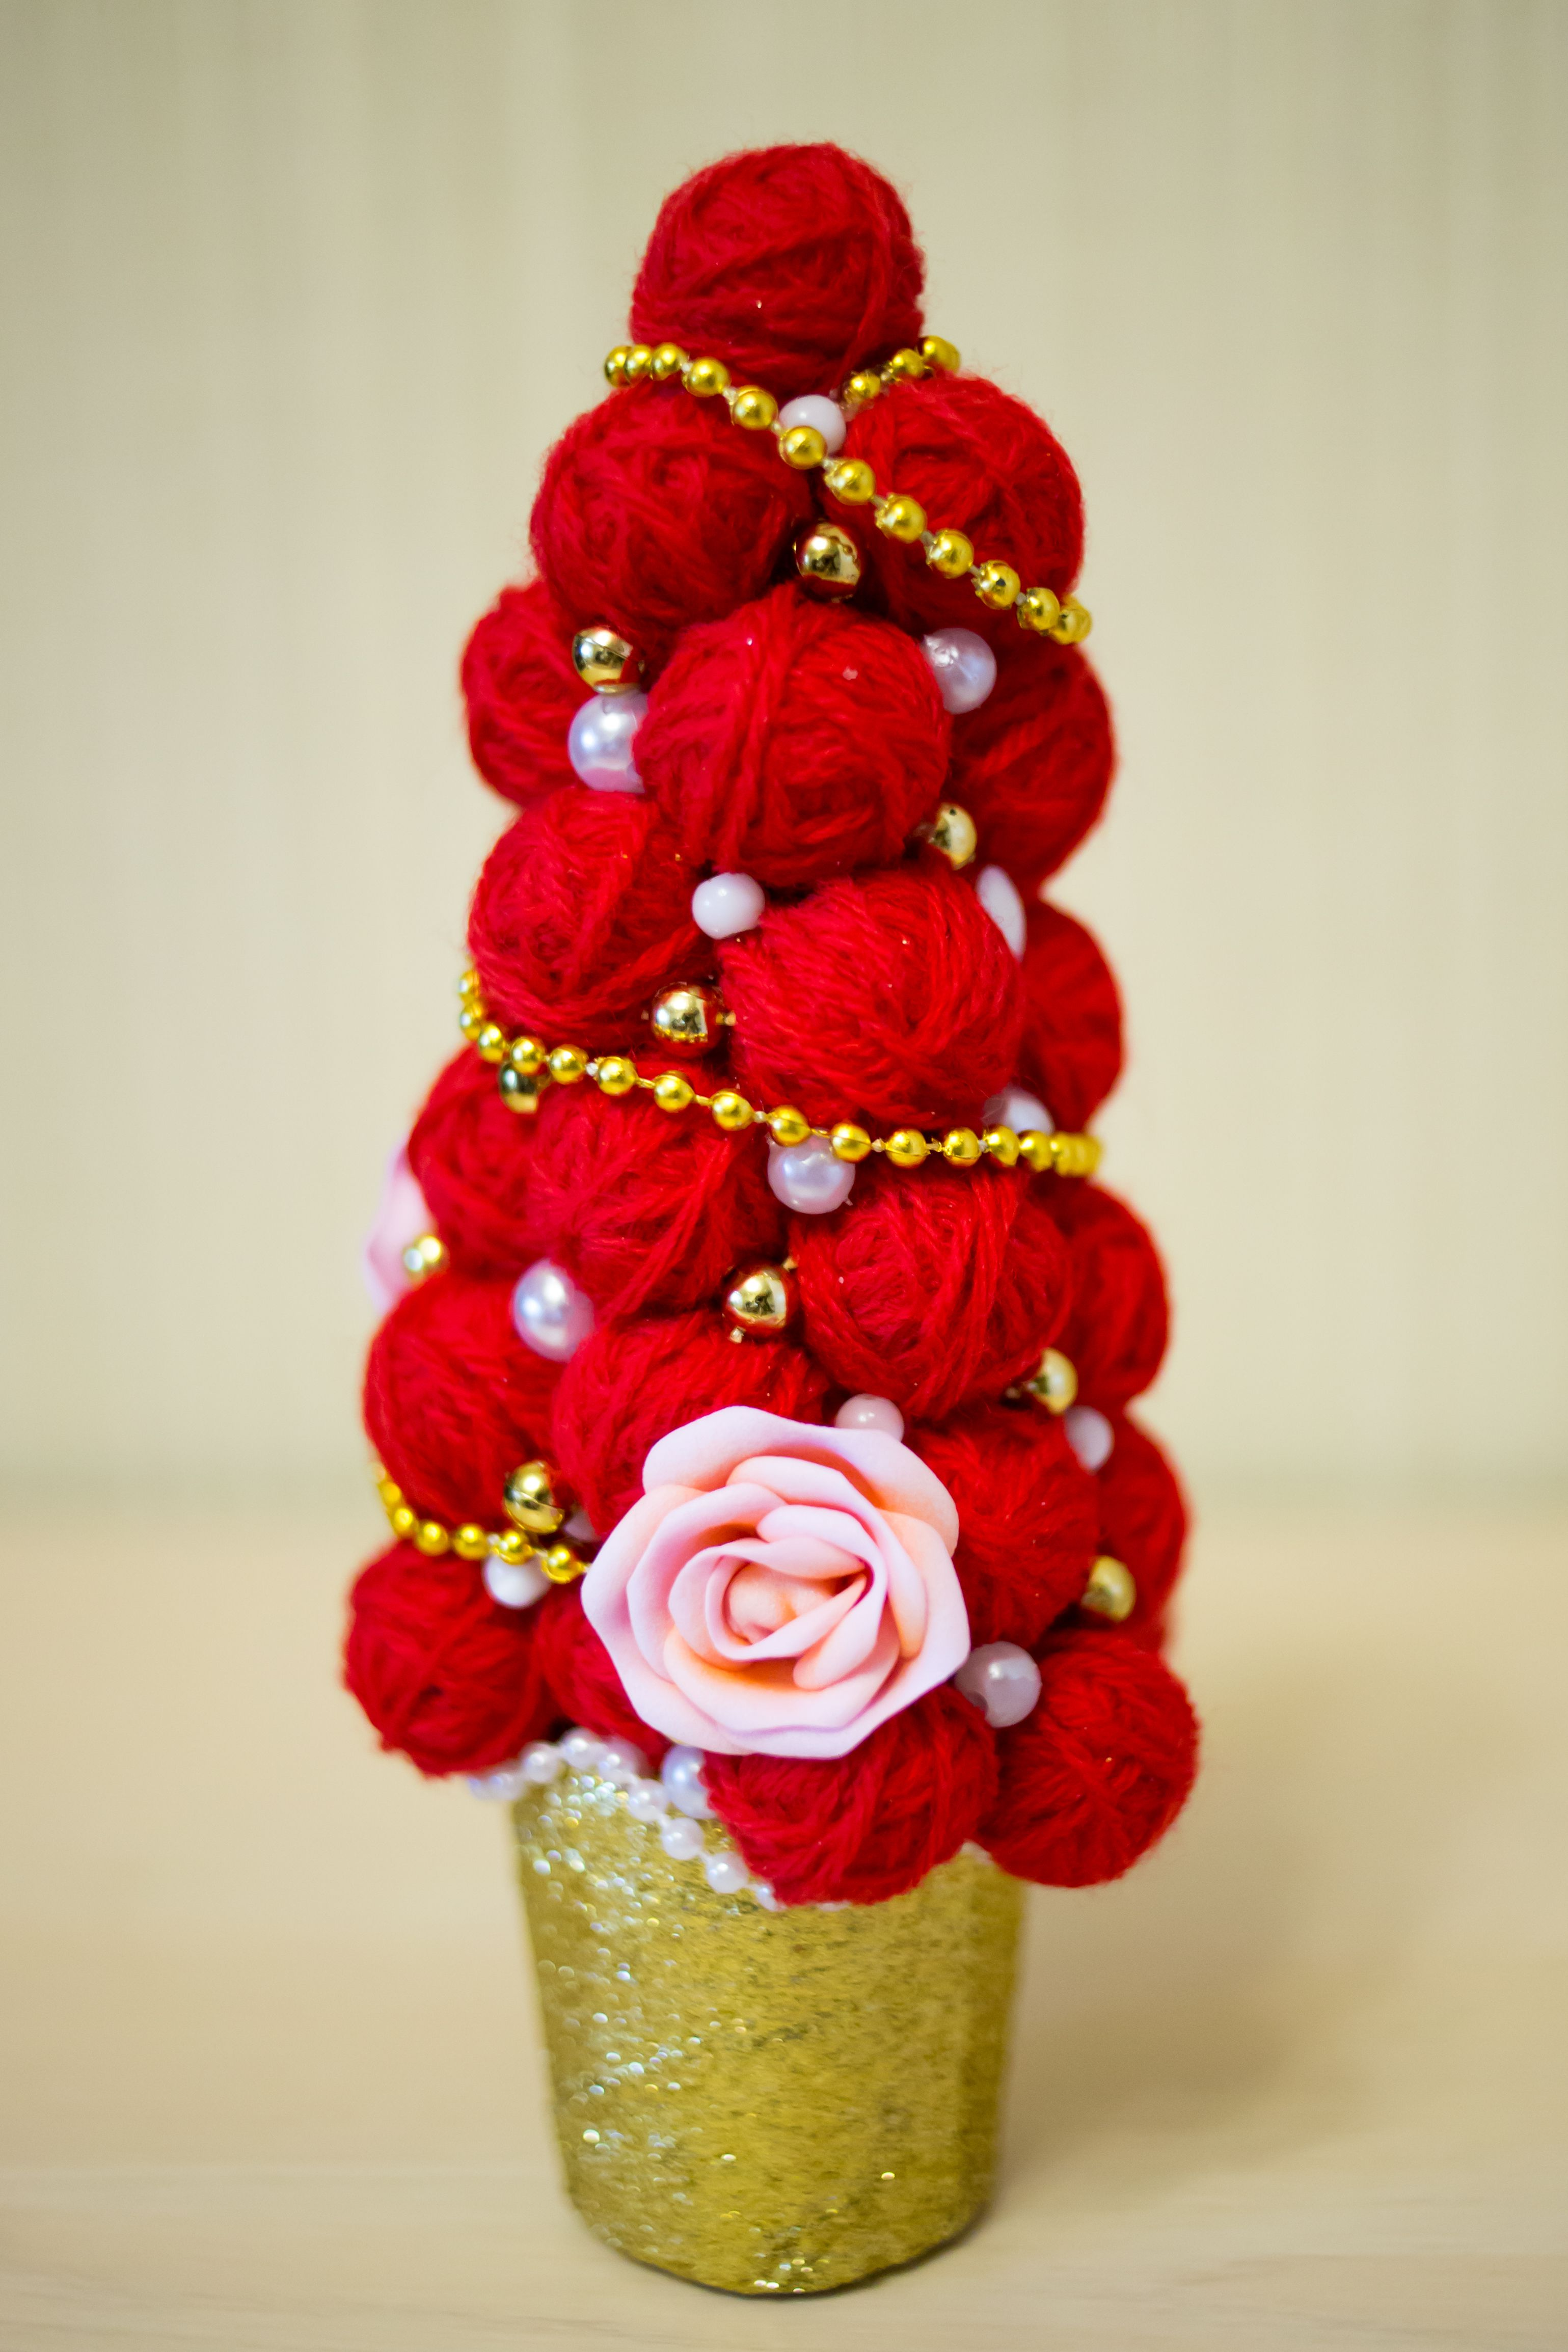 красивая хэнд-мейд красная елочка модная фоамиран елка декор пряжа